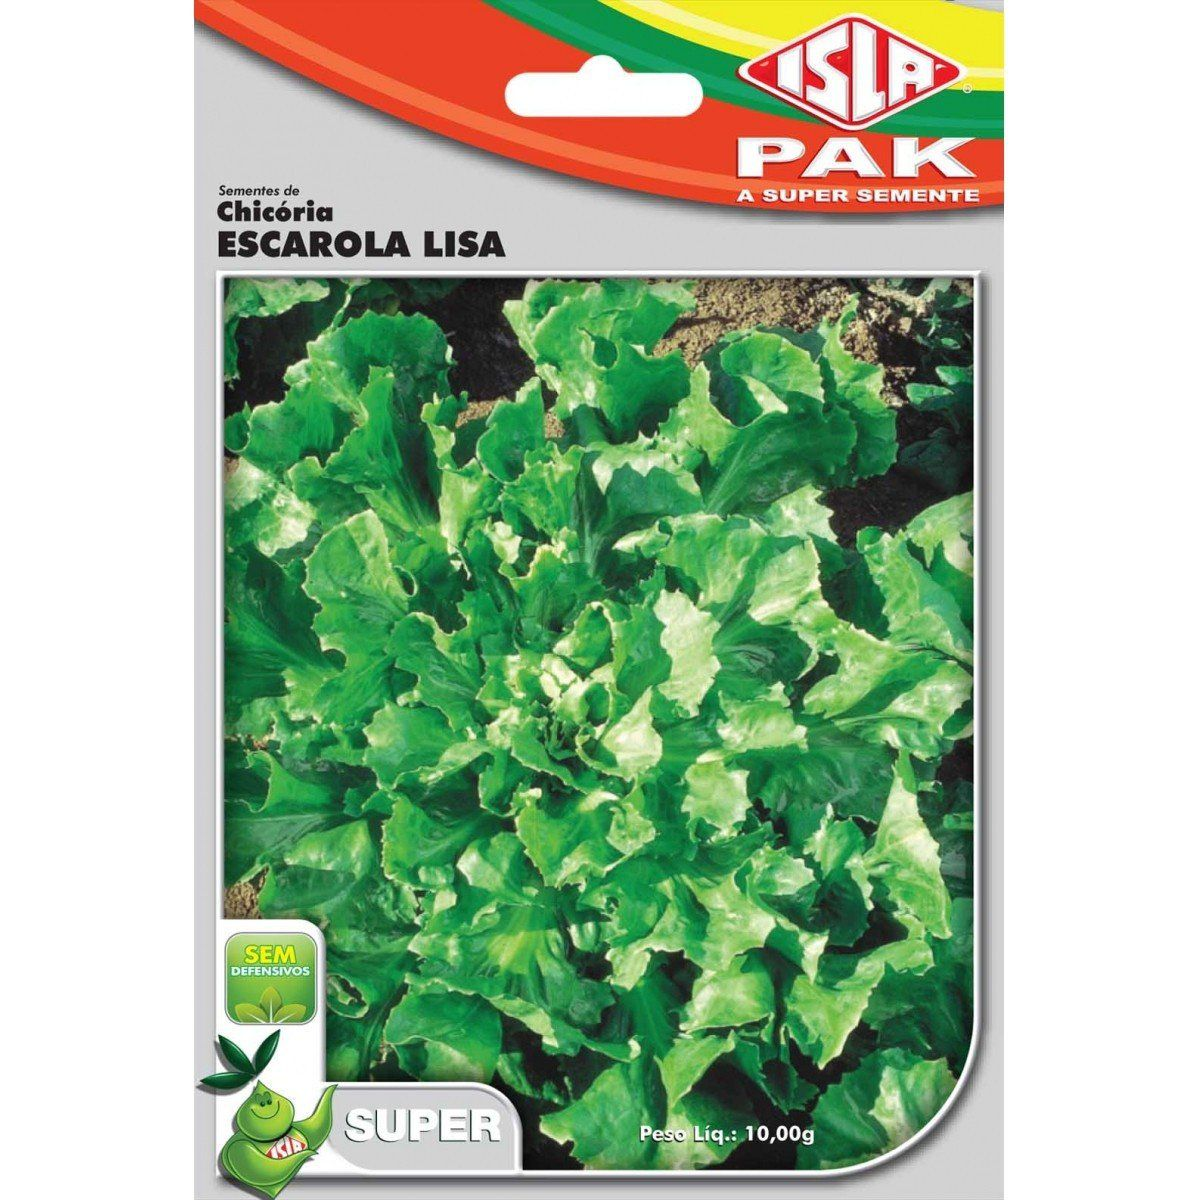 Sementes de Chicória Escarola Lisa (Isla Superpak)